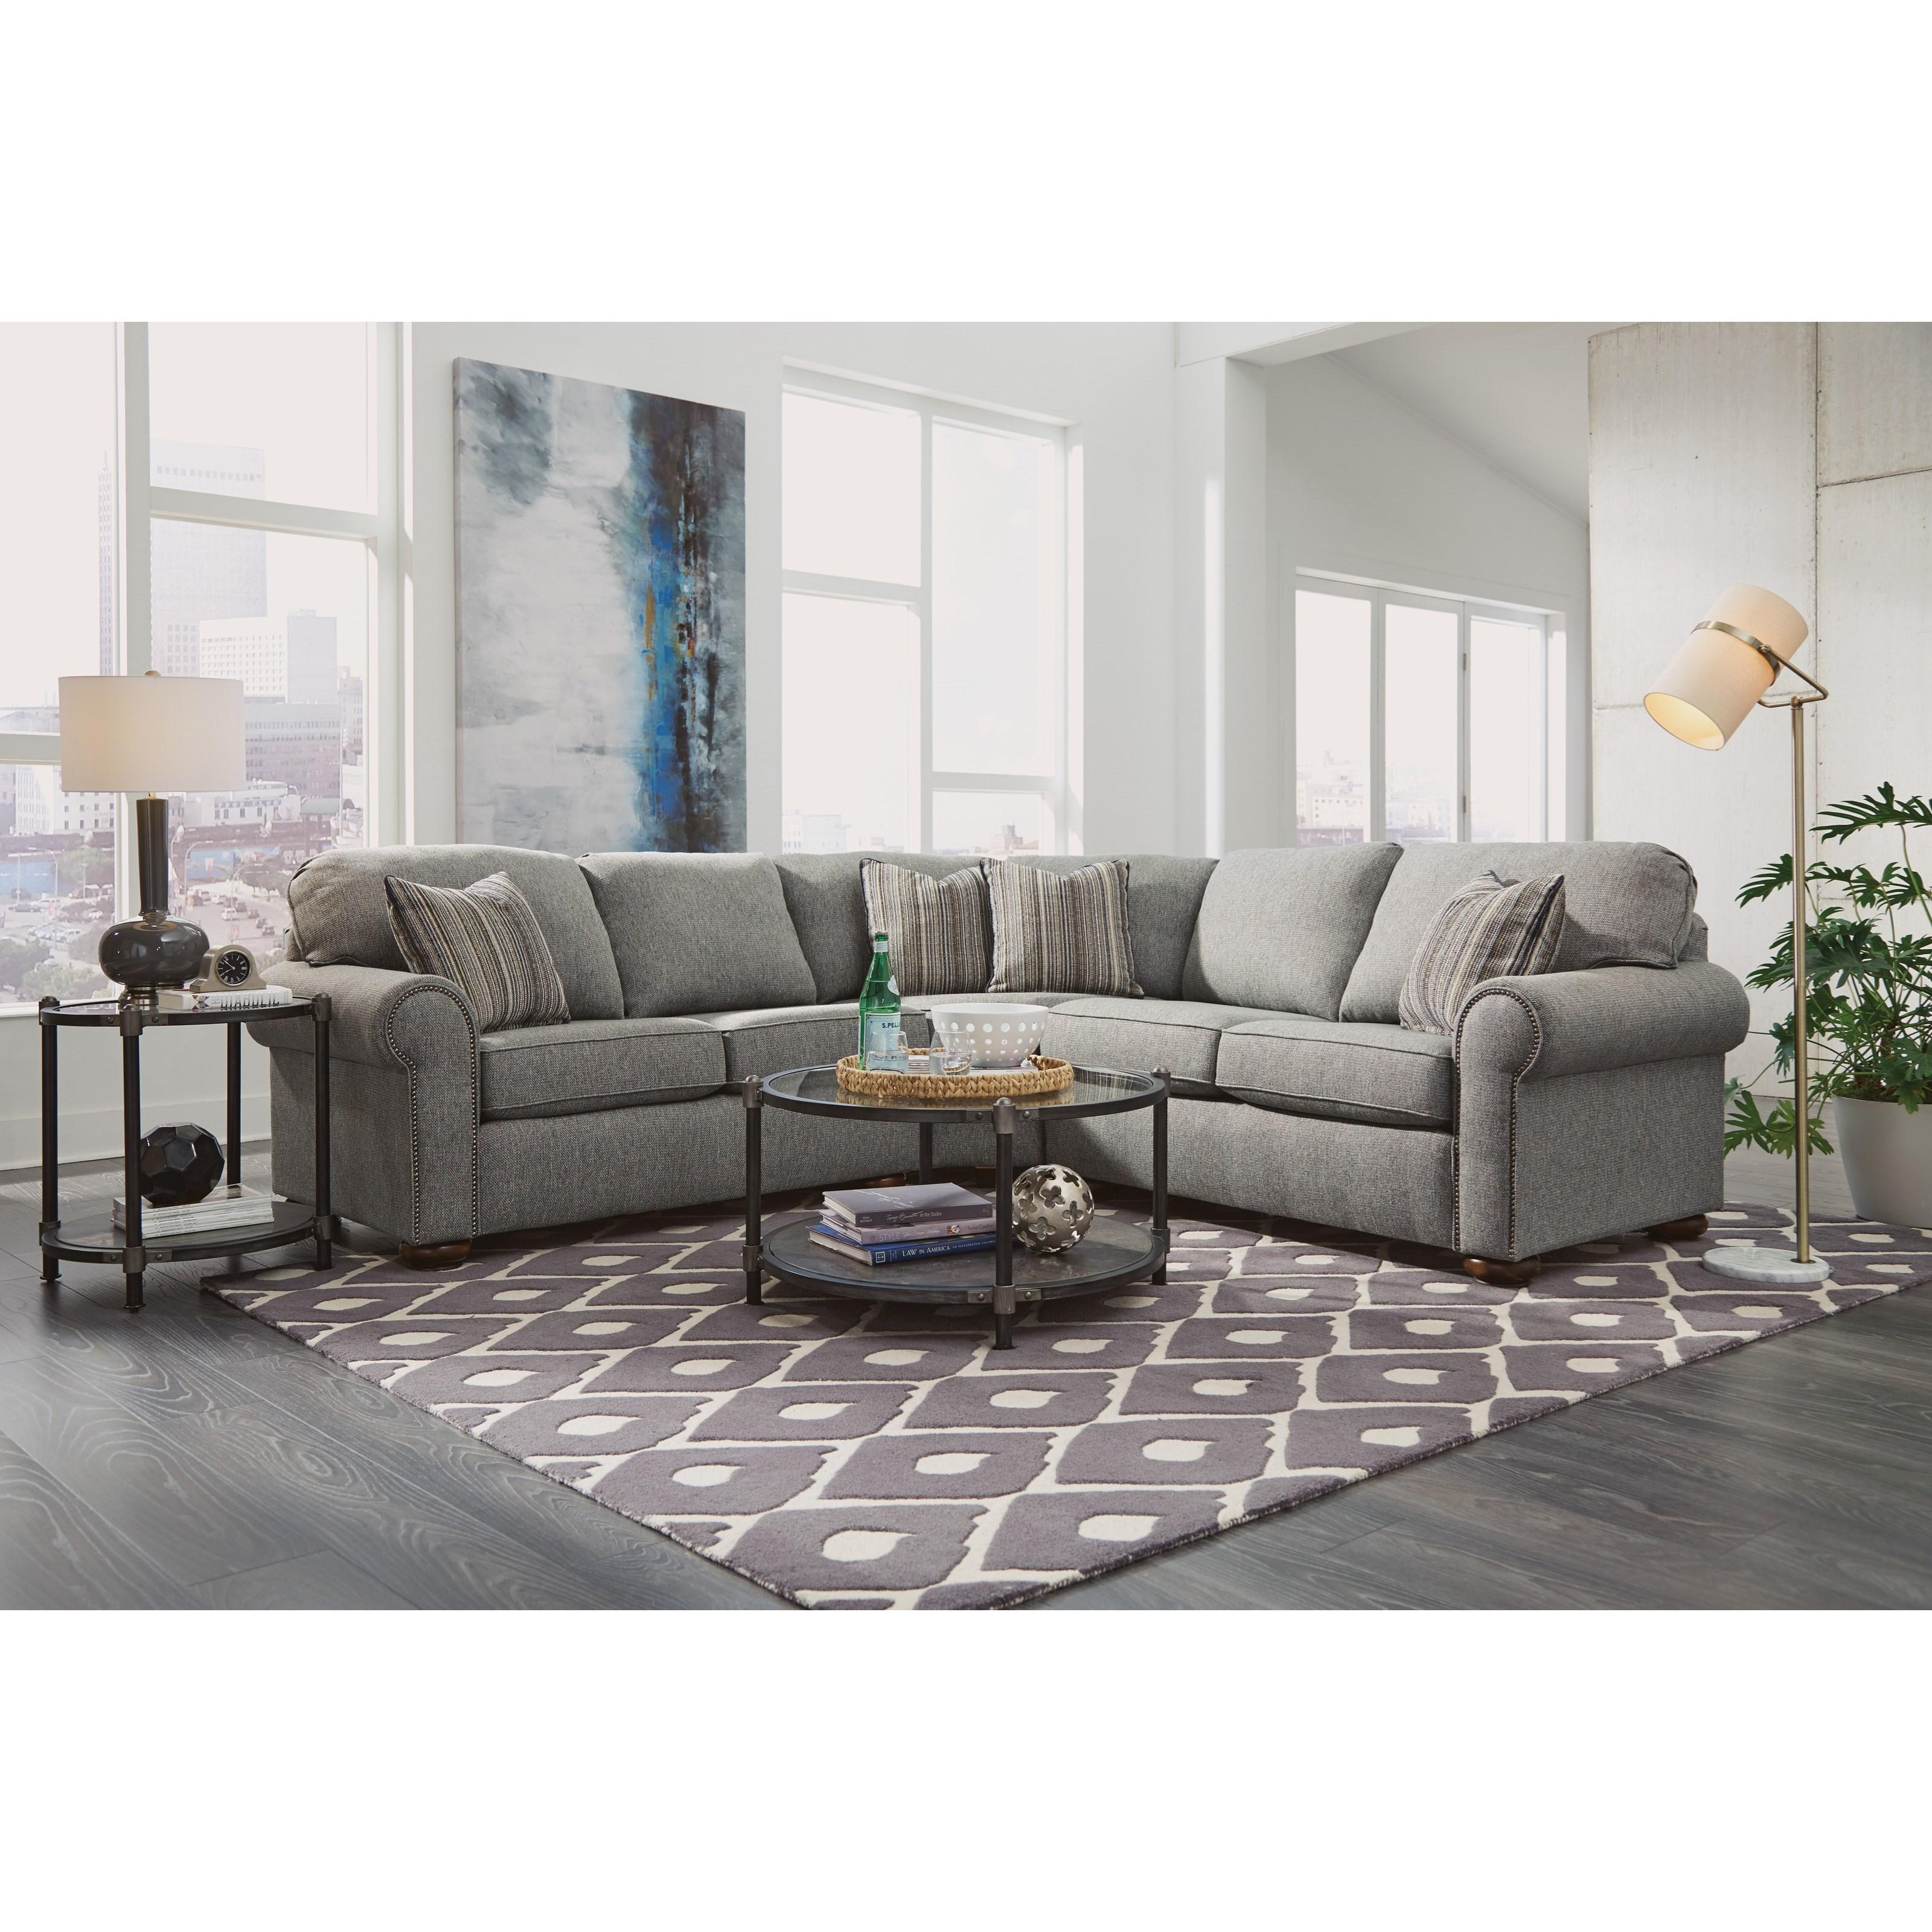 Leather Sofas Preston Lancashire: Flexsteel Preston Traditional 4 Seat Sectional Sofa With